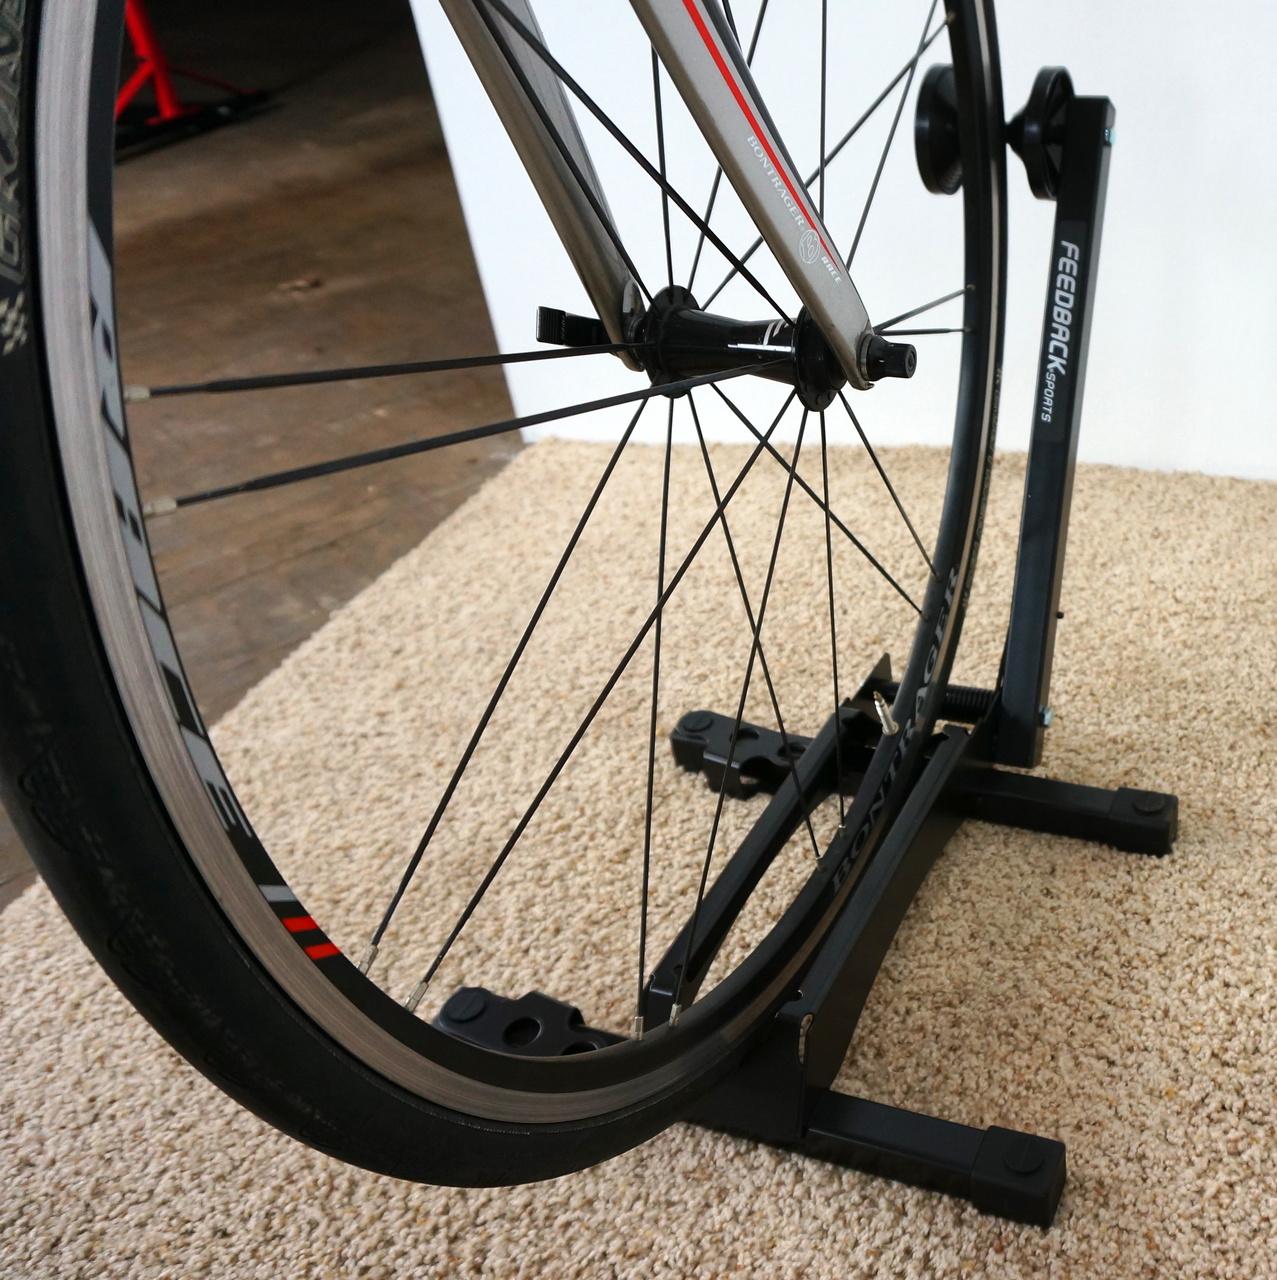 storage stand for bikes & Freestanding Bike Storage and Display Stand - StoreYourBoard.com